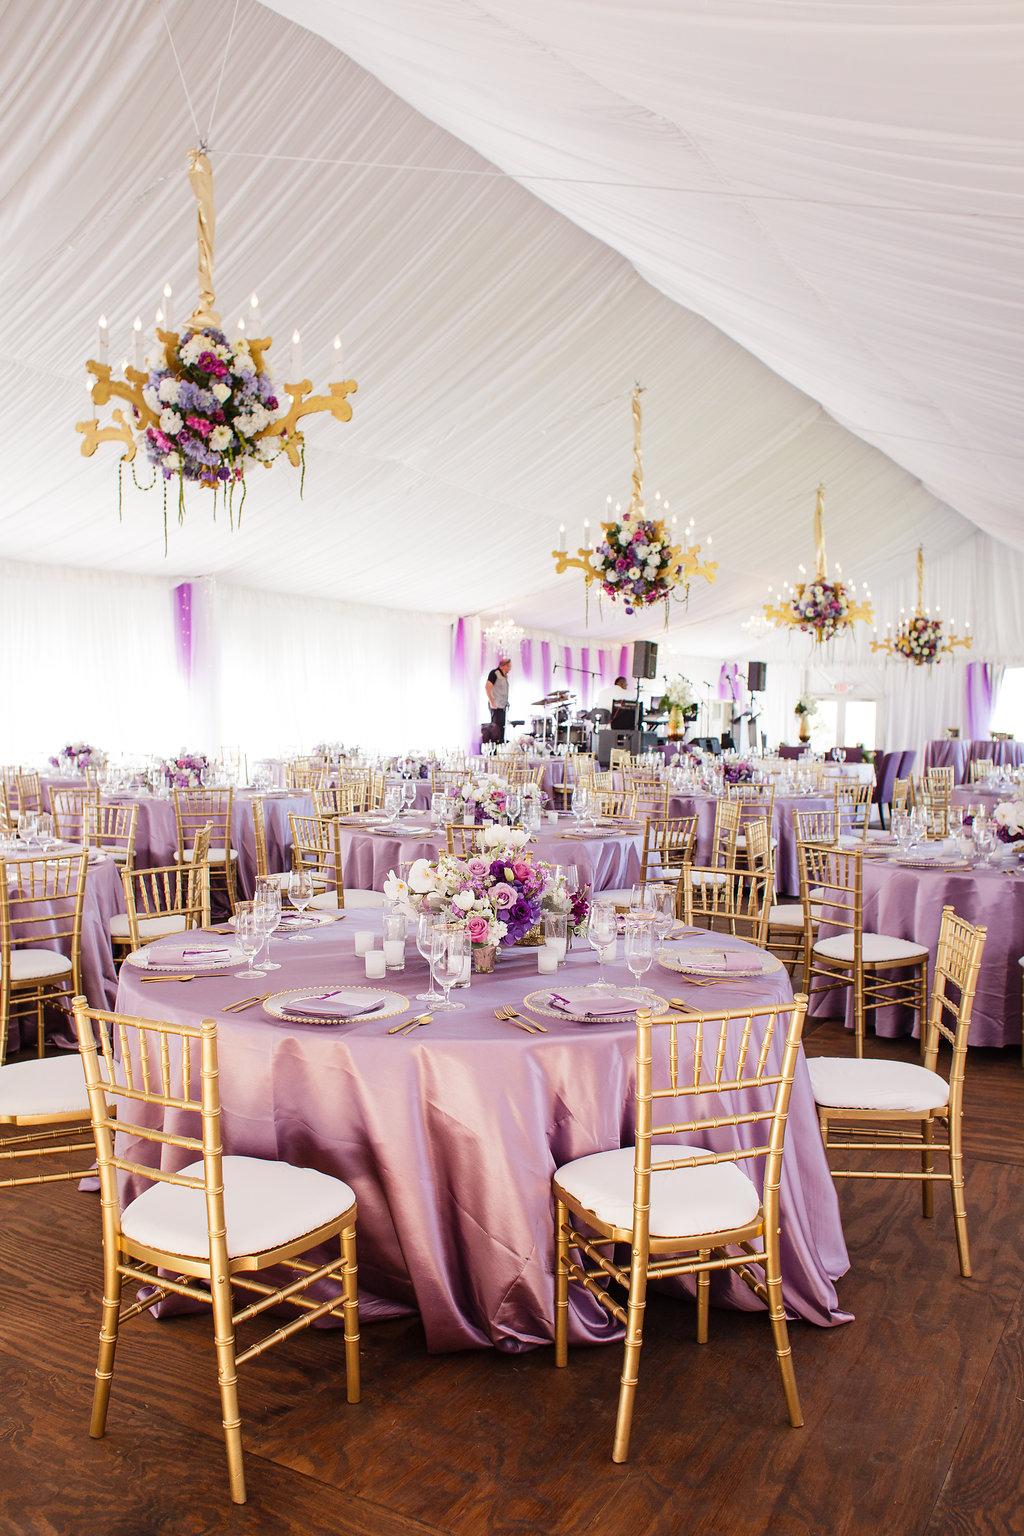 waldorf-astoria-wedding-photography-17.jpg